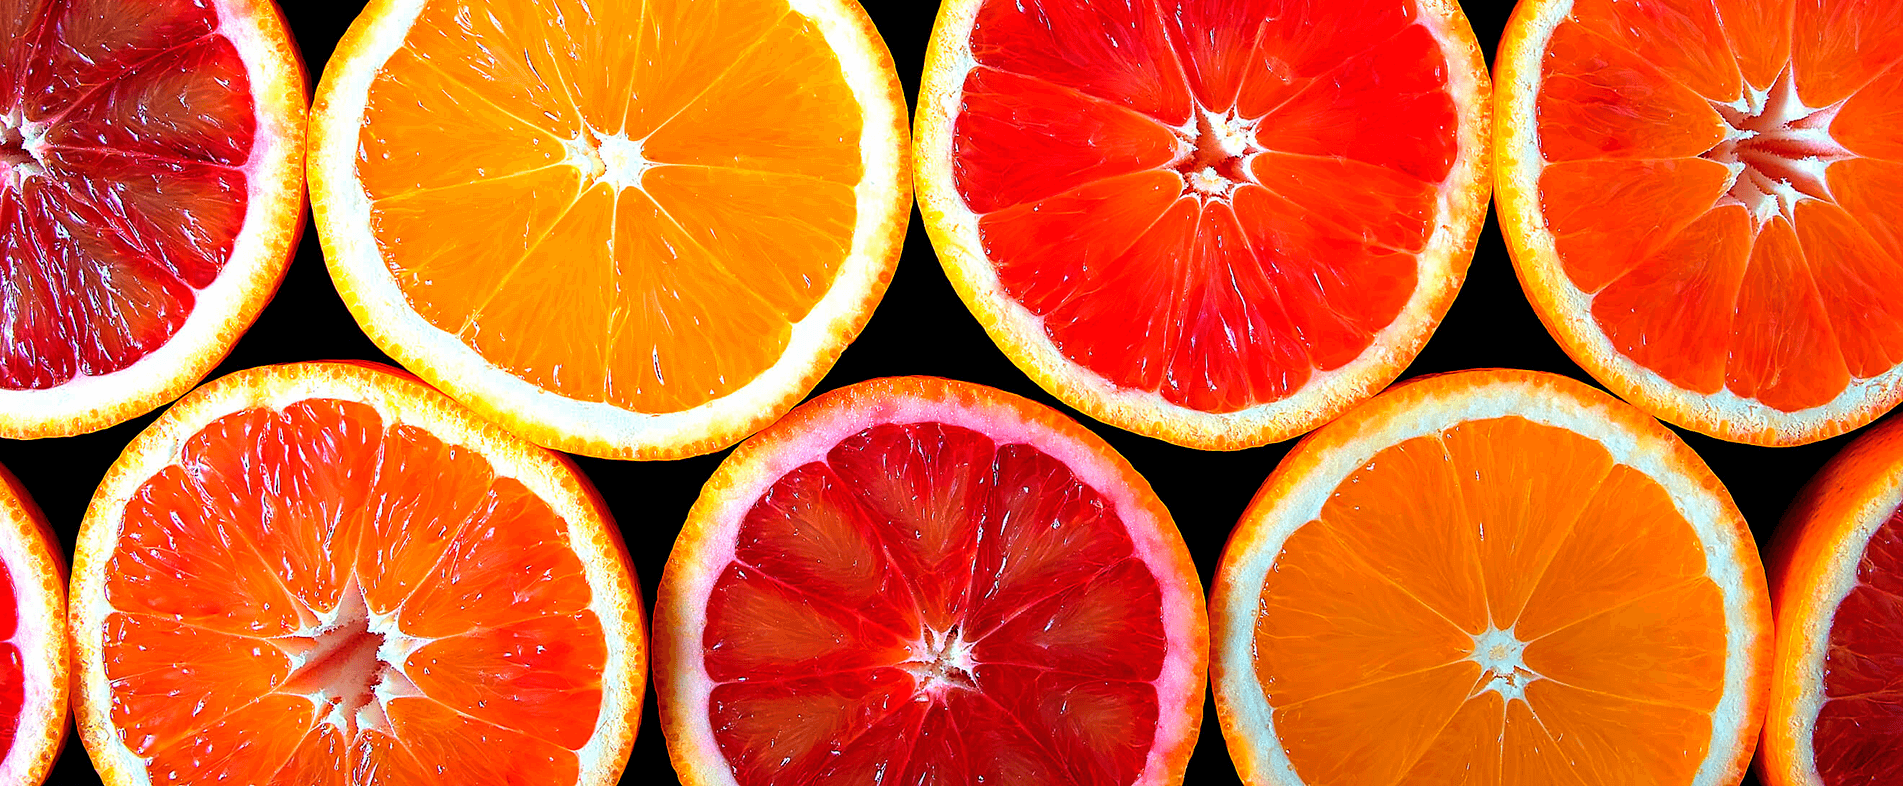 mostarda di arance le tamerici srl